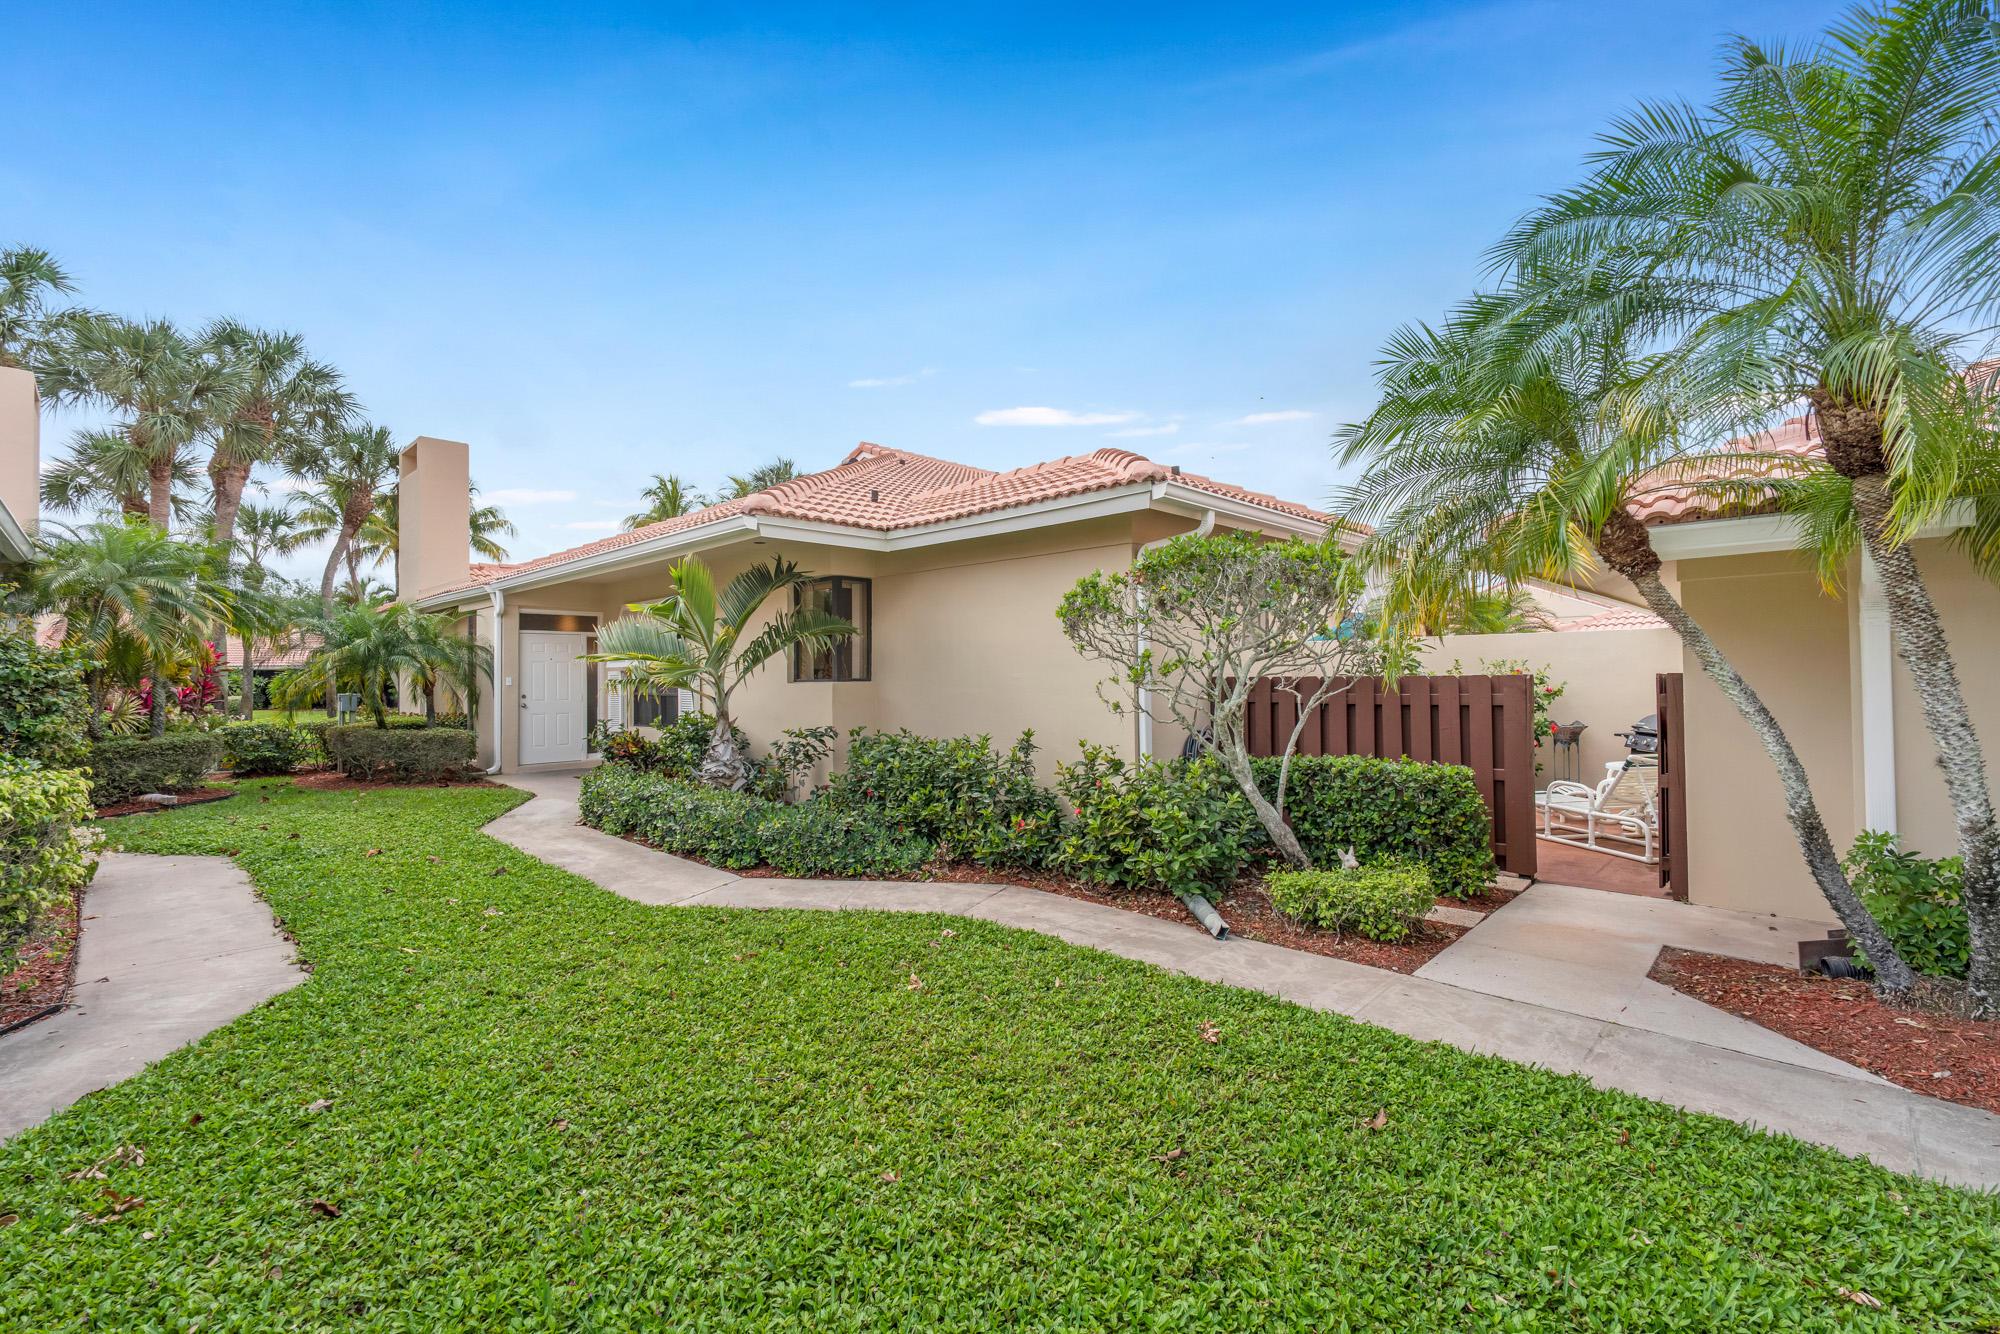 135 Old Meadow Way, Palm Beach Gardens, Florida 33418, 2 Bedrooms Bedrooms, ,2 BathroomsBathrooms,F,Villa,Old Meadow,RX-10707036